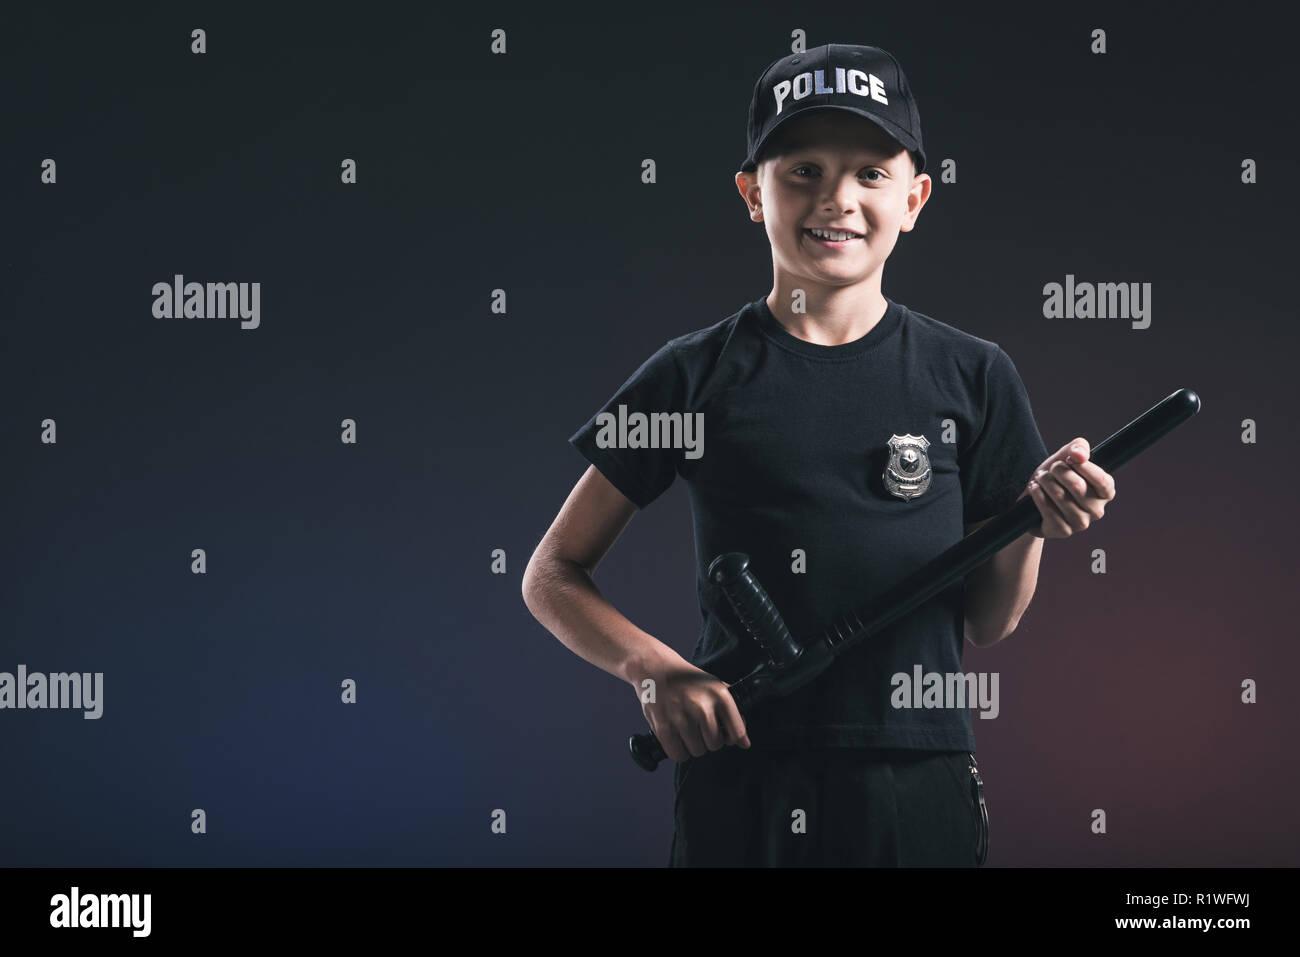 smiling preteen boy in policeman uniform with truncheon on dark backdrop - Stock Image